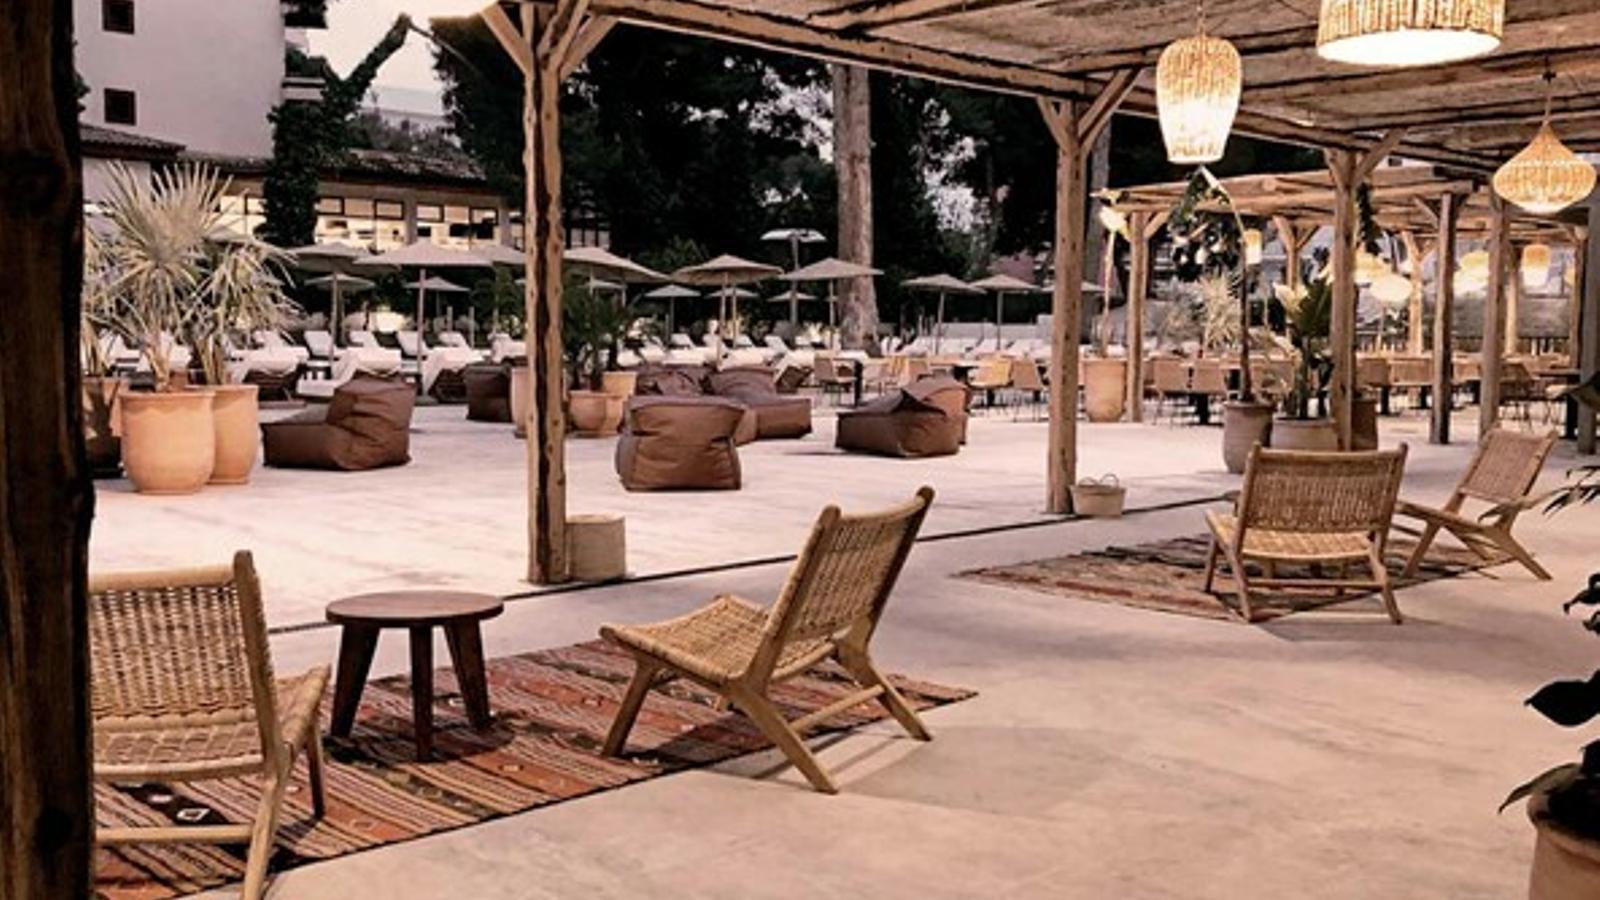 Hotel Cook's Palace Palma